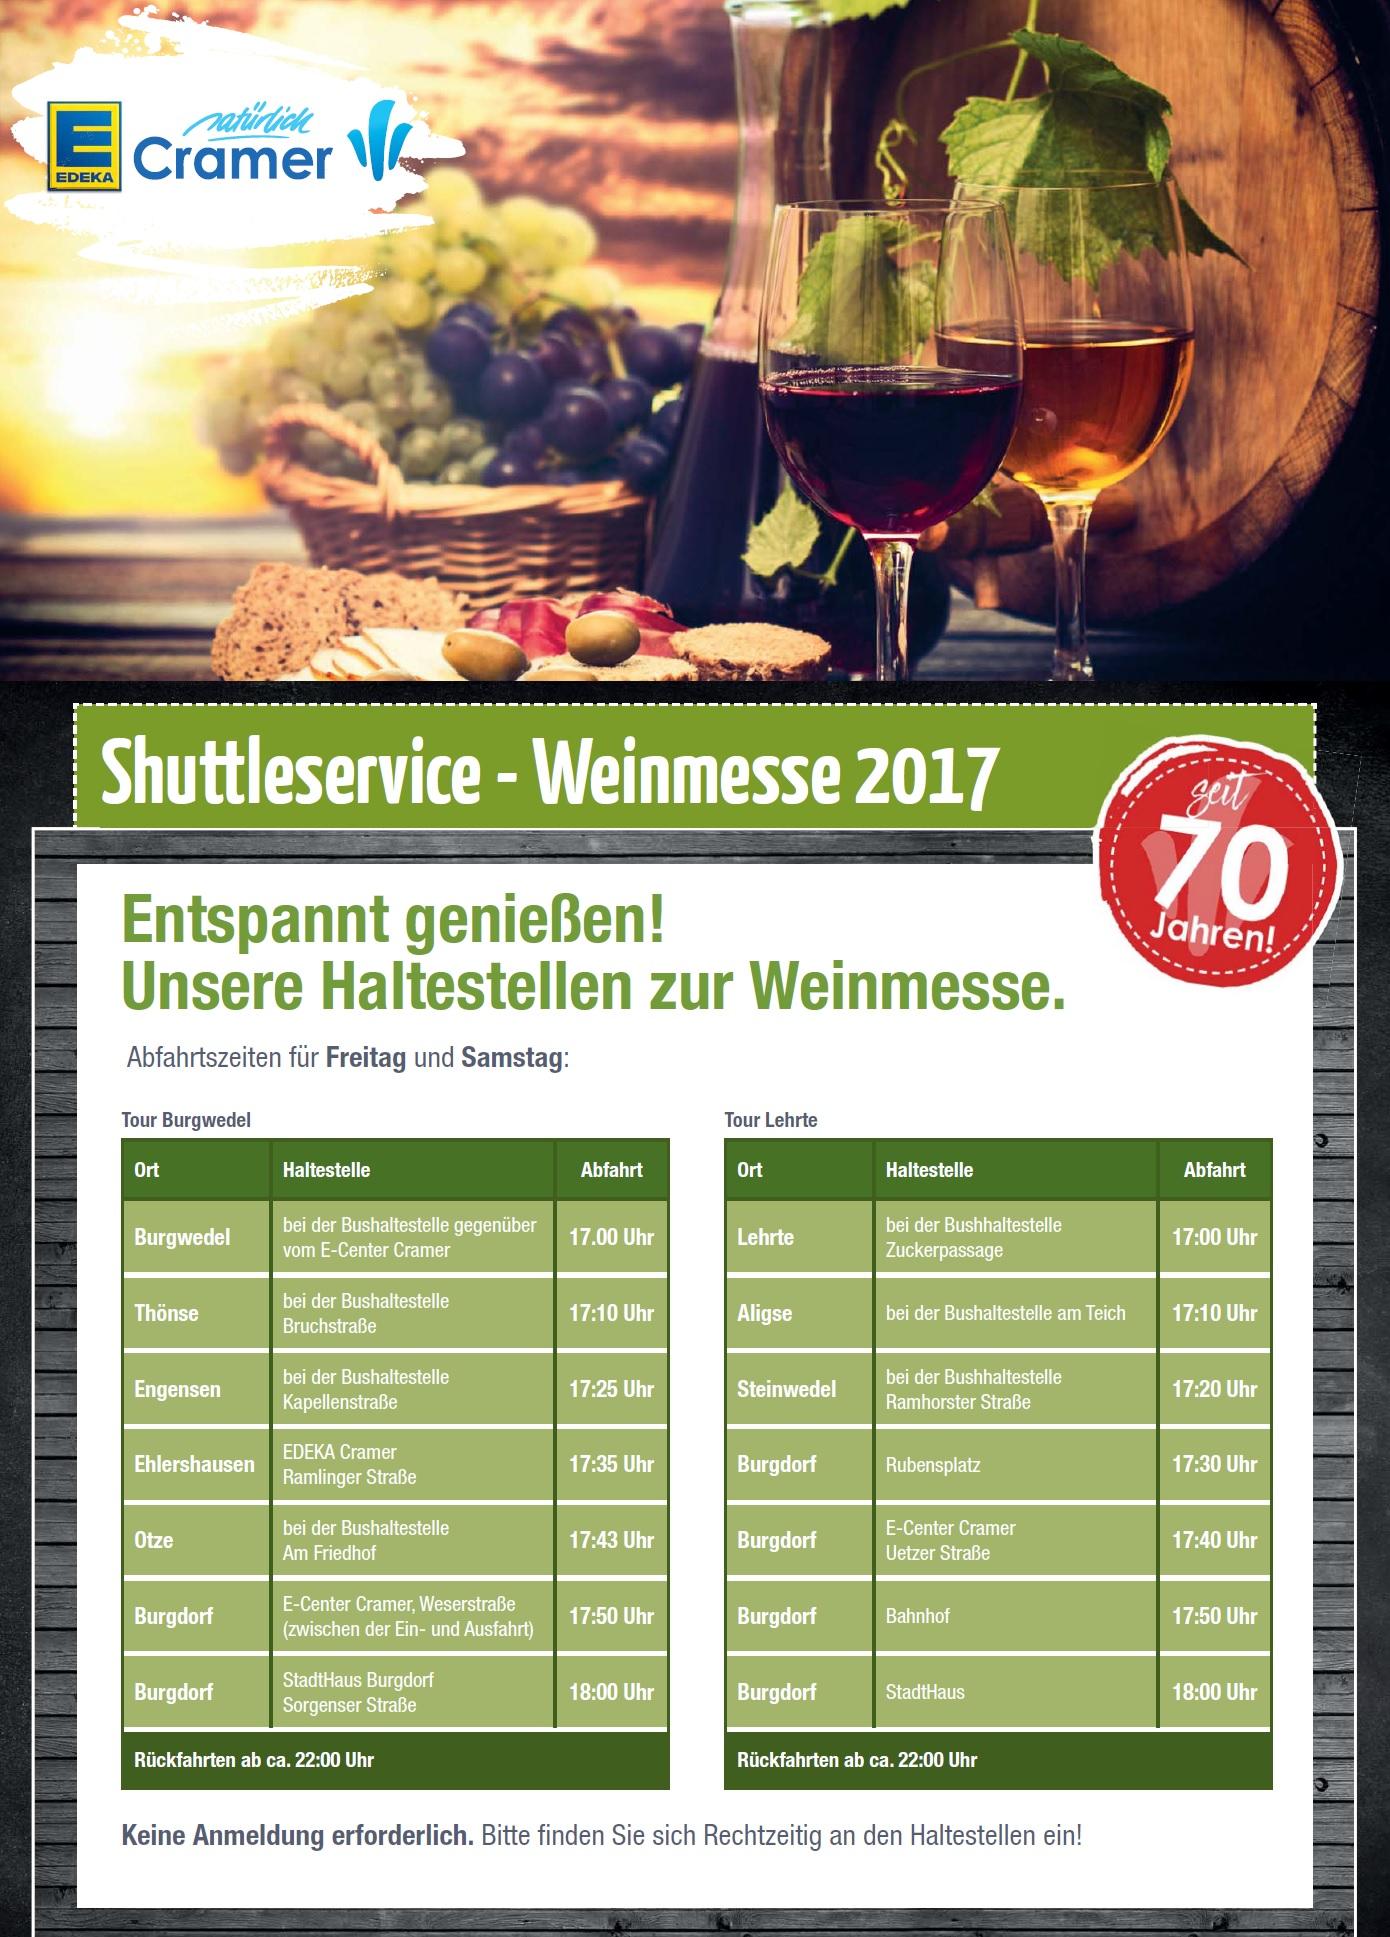 Edeka Cramer Weinmesse